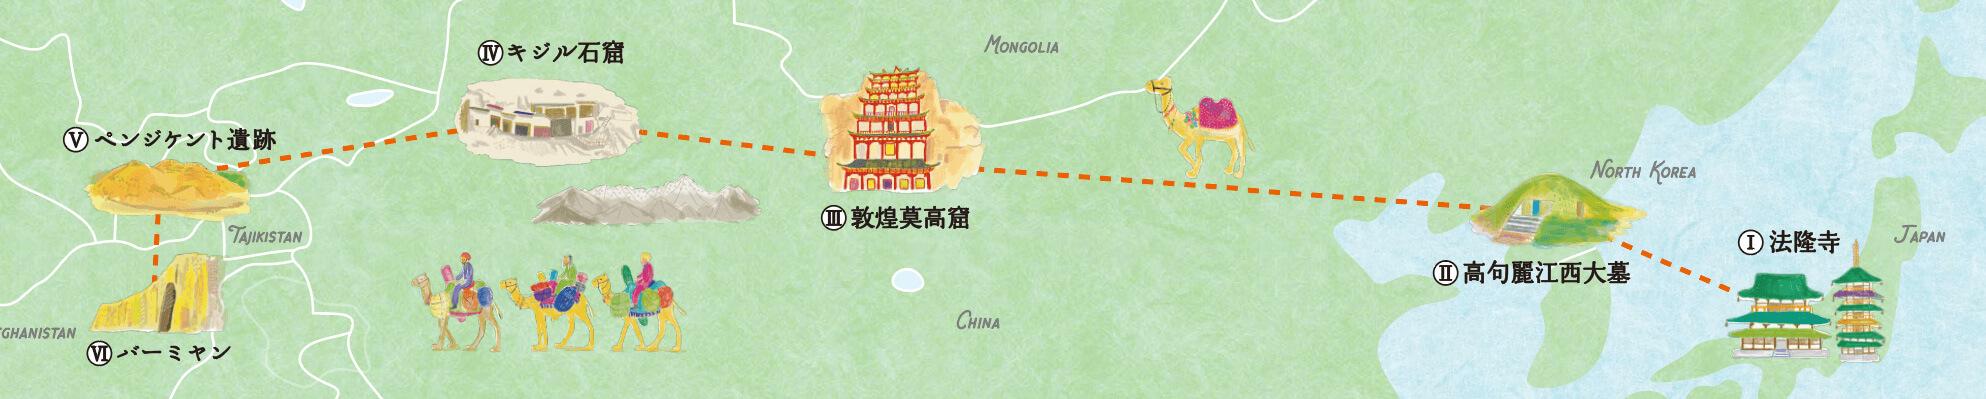 月刊fu 遺跡Map